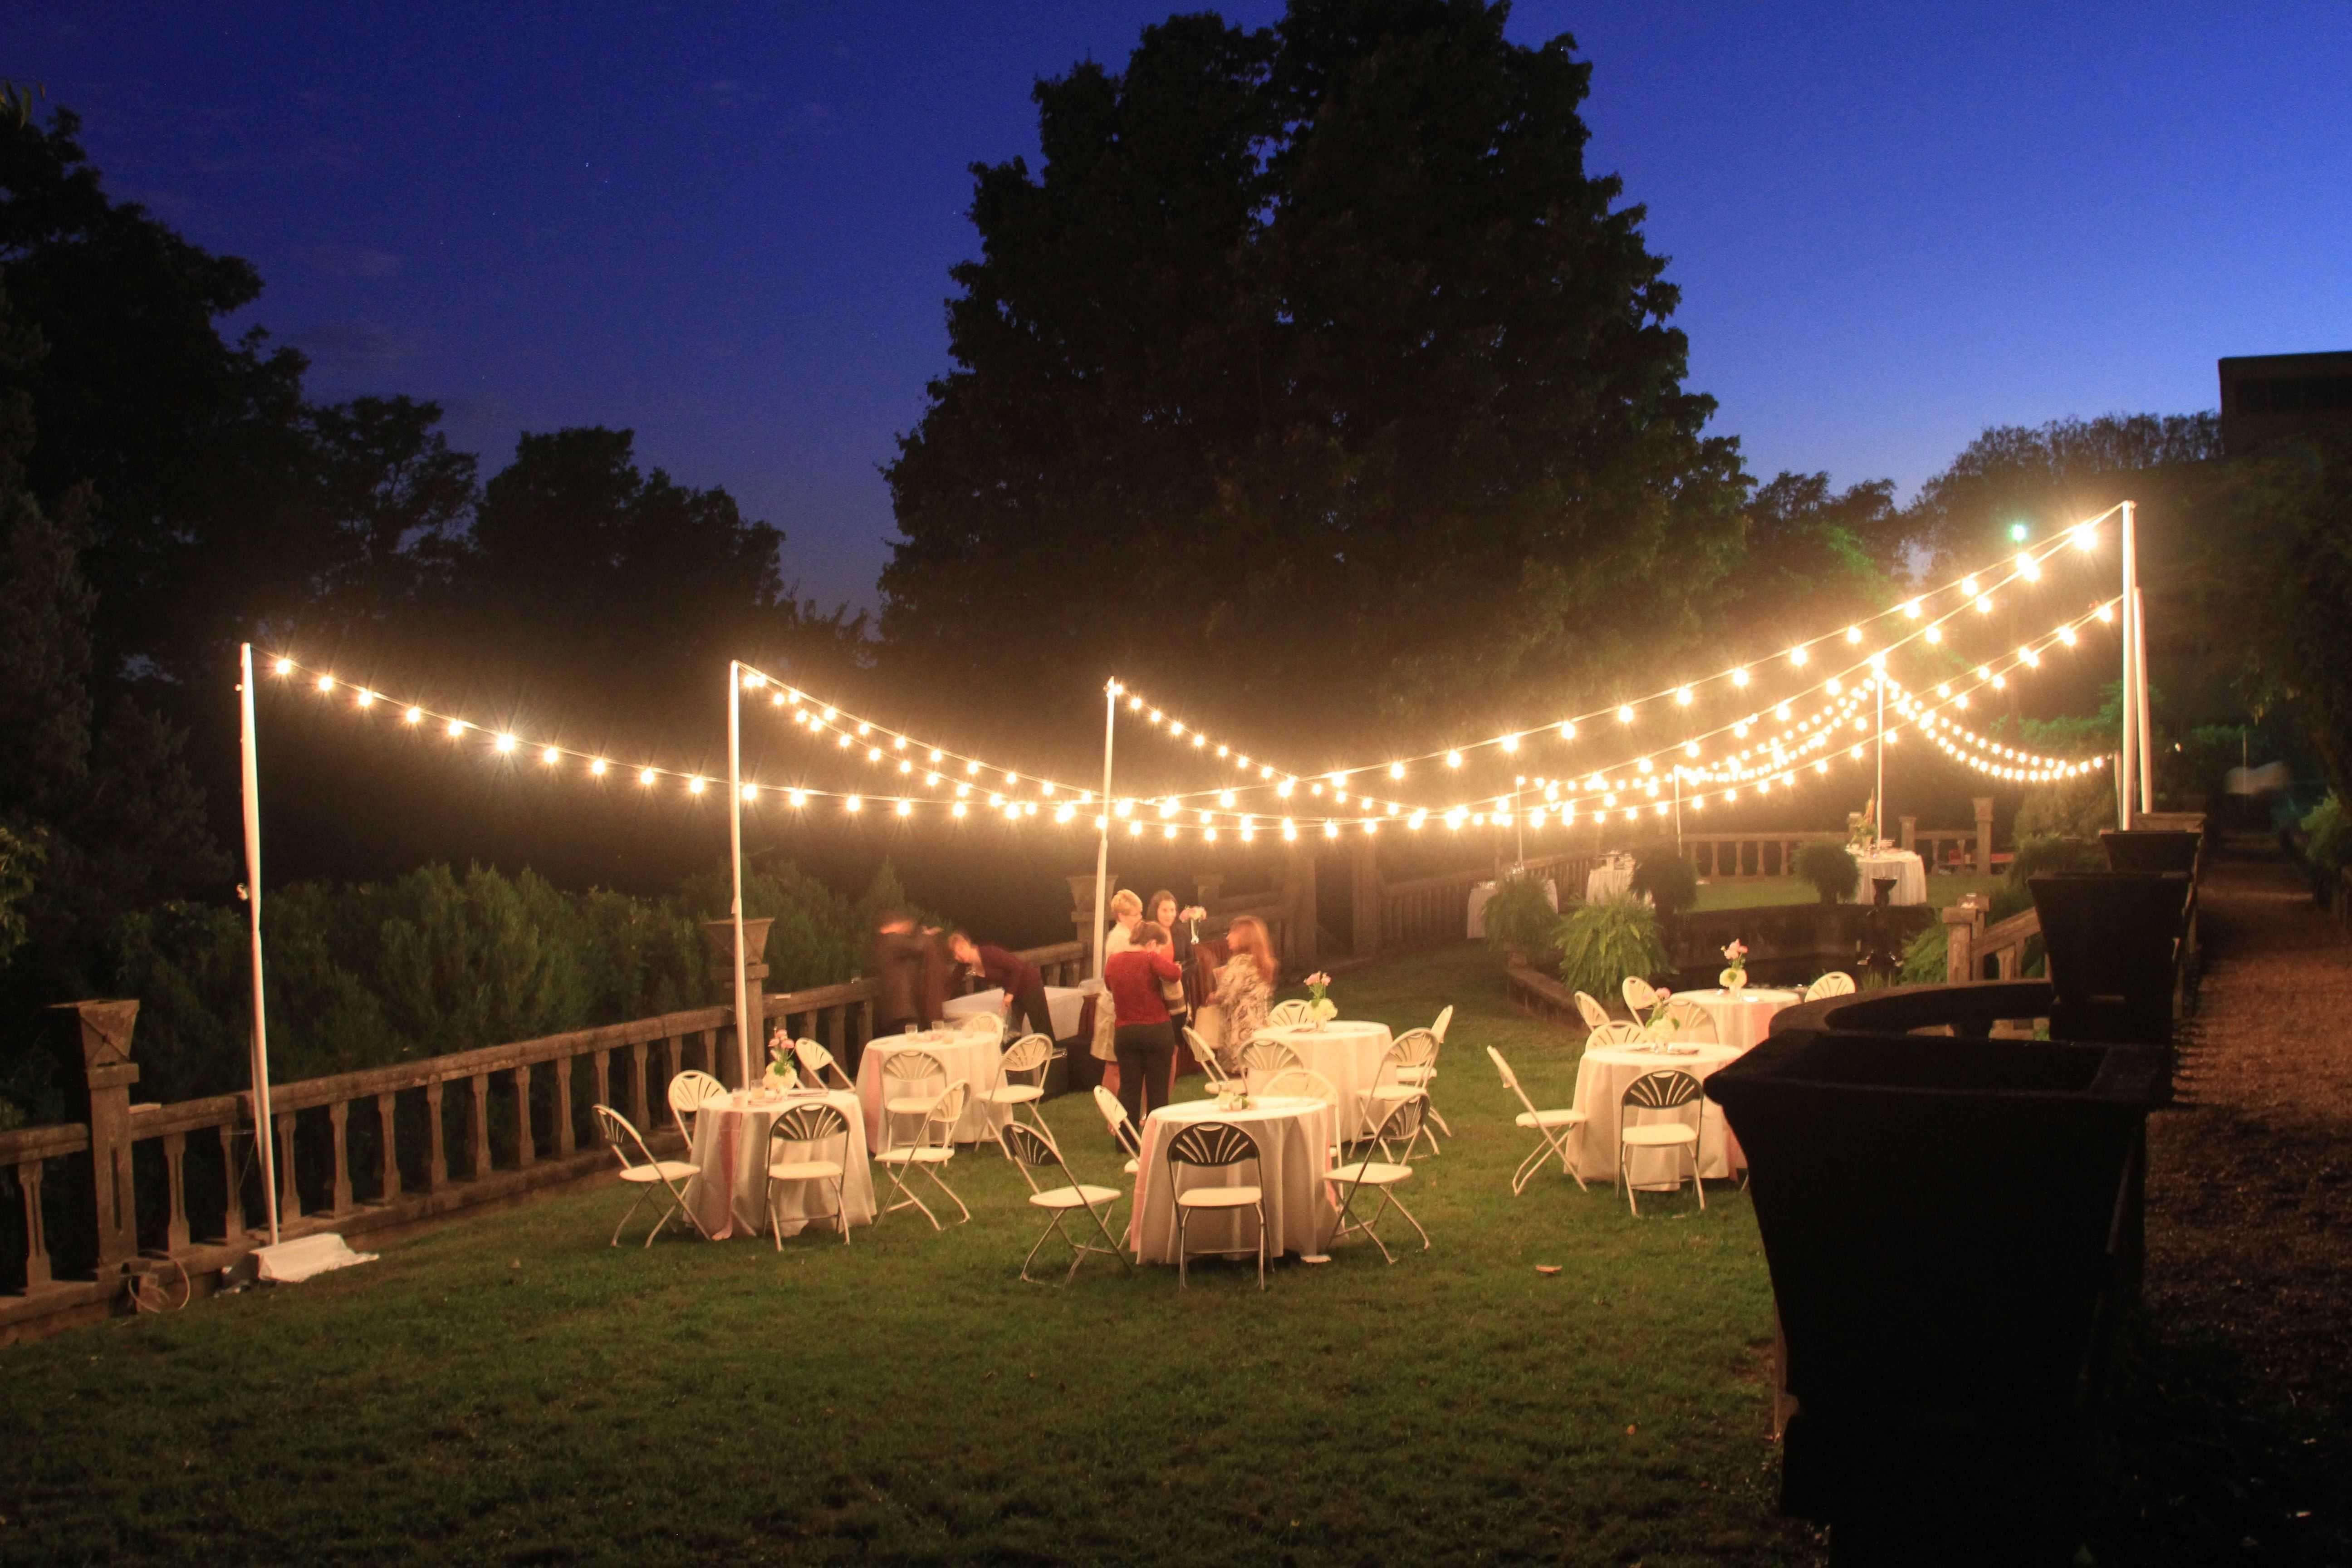 15 Wonderful Diy Backyard Lighting Ideas For Small Party At Night